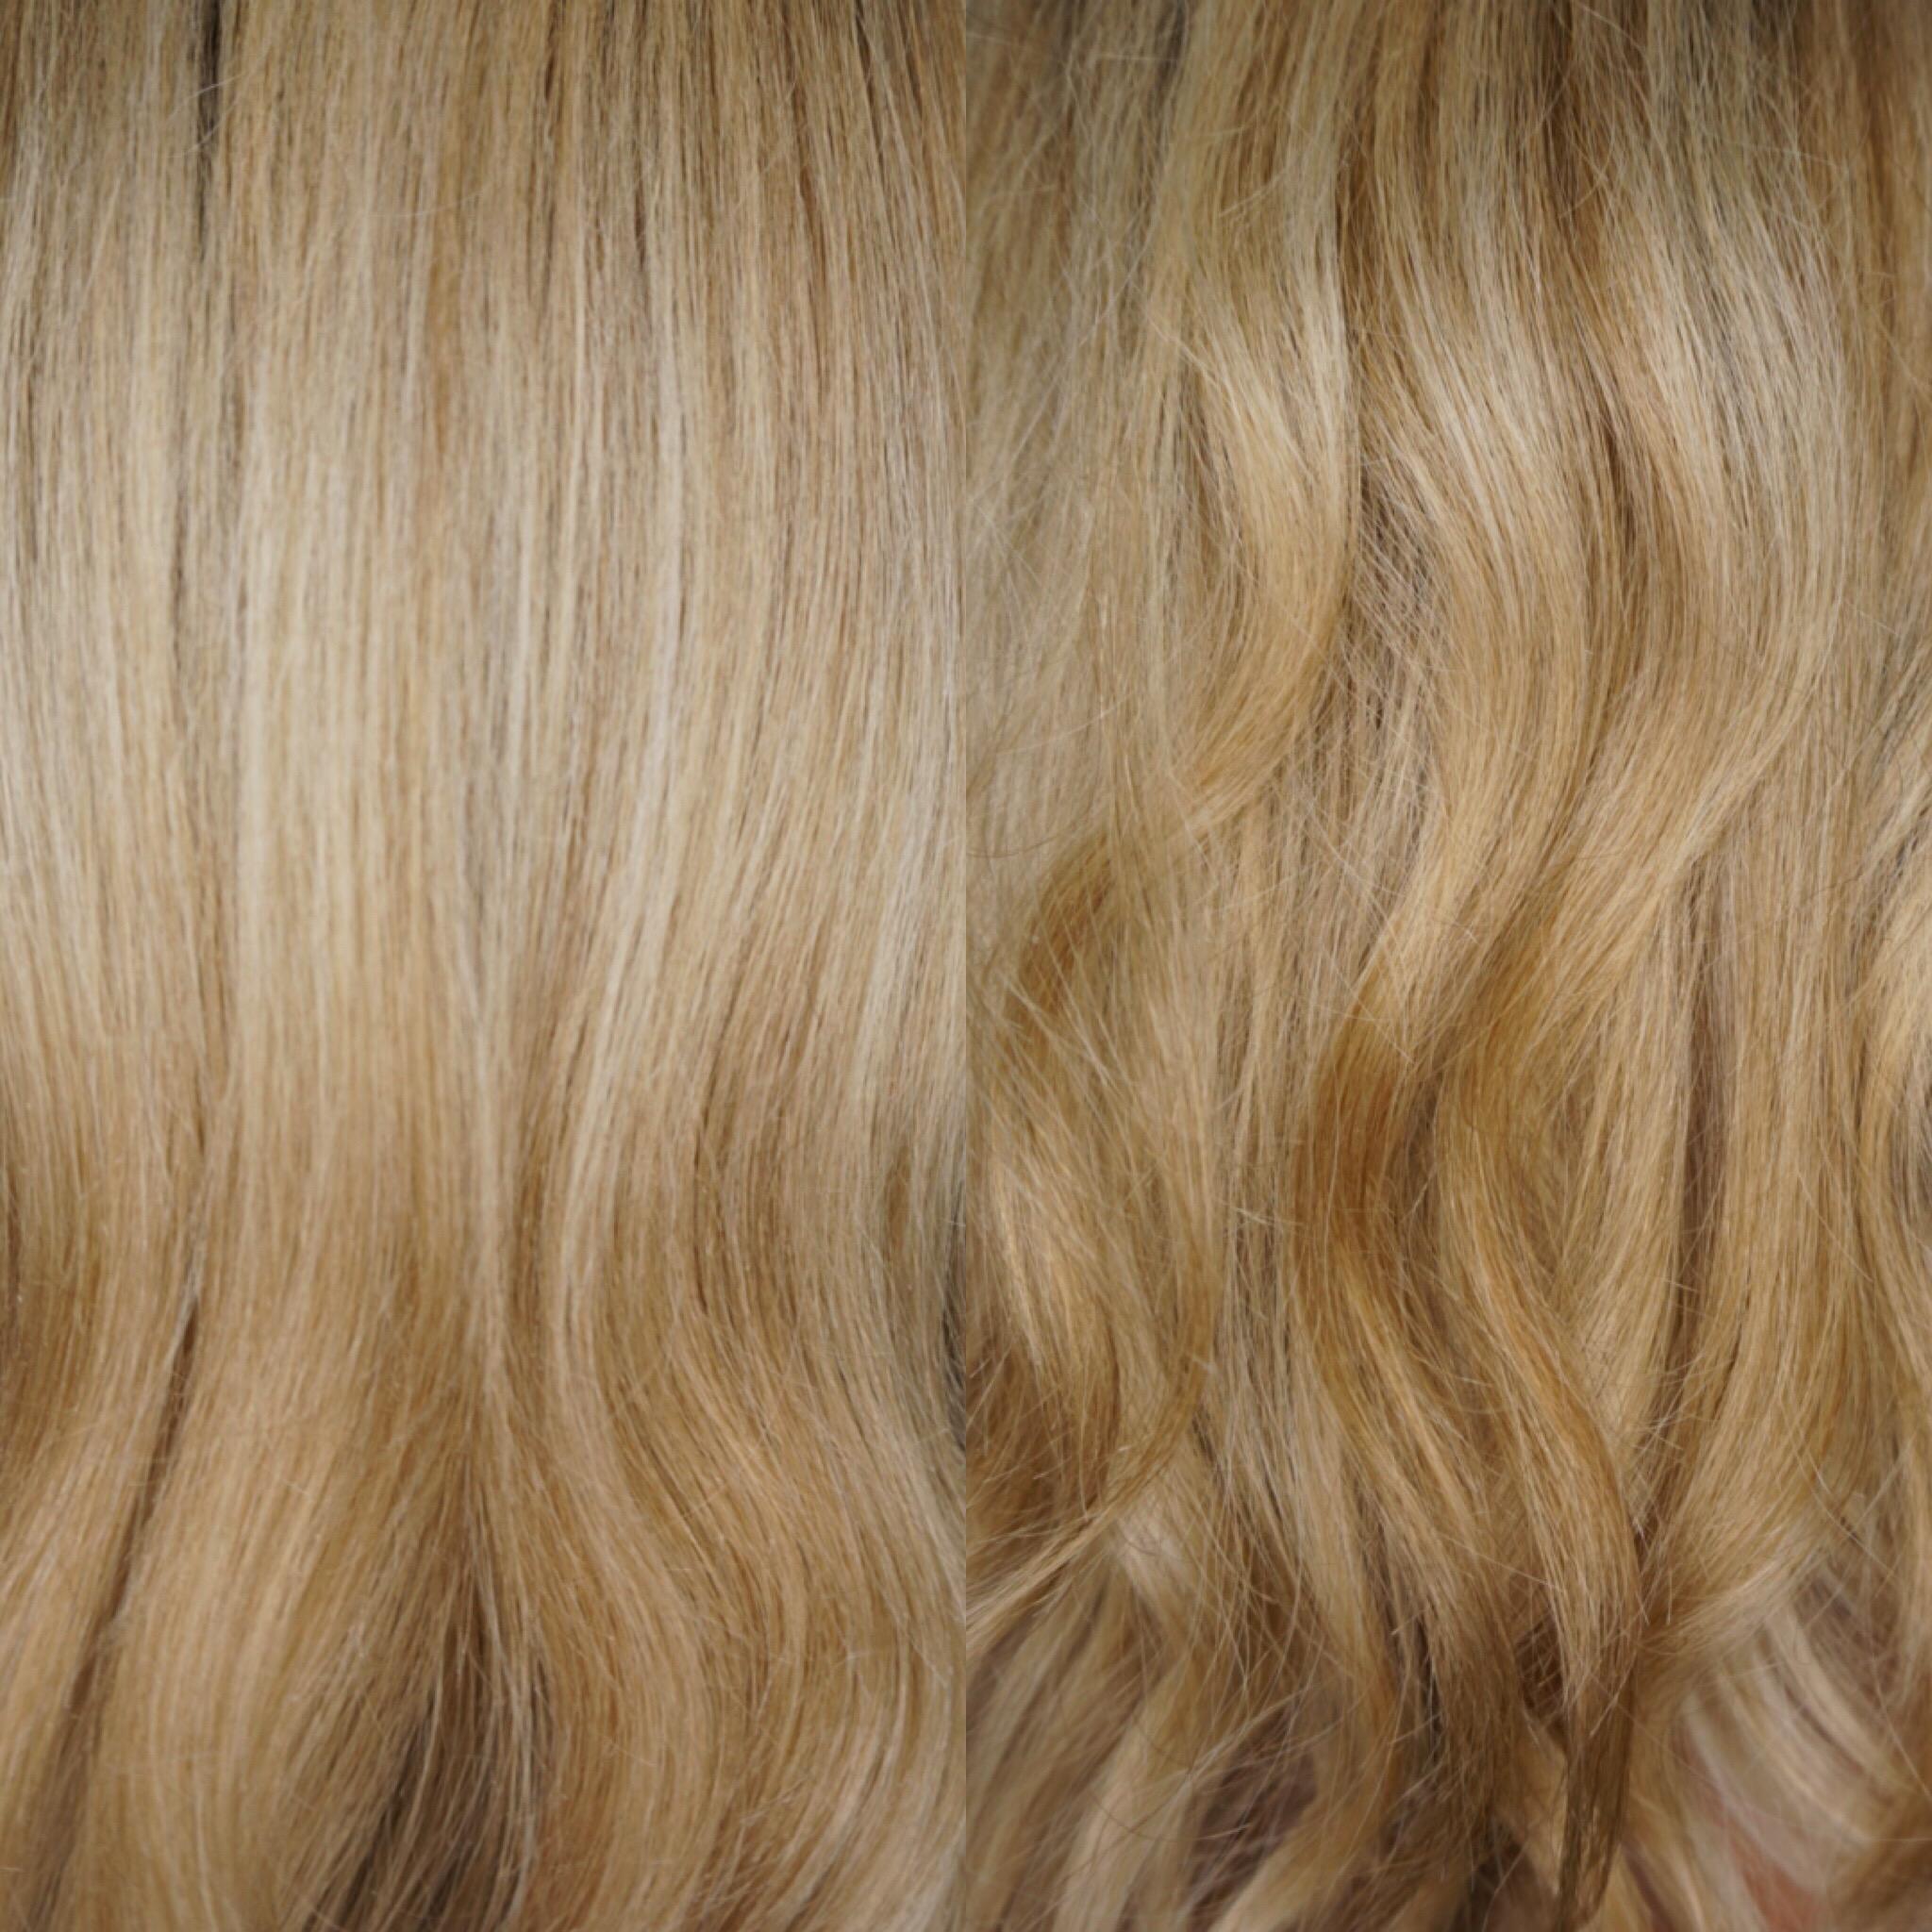 At Home Hair Toning Christophe Robin Golden Blond